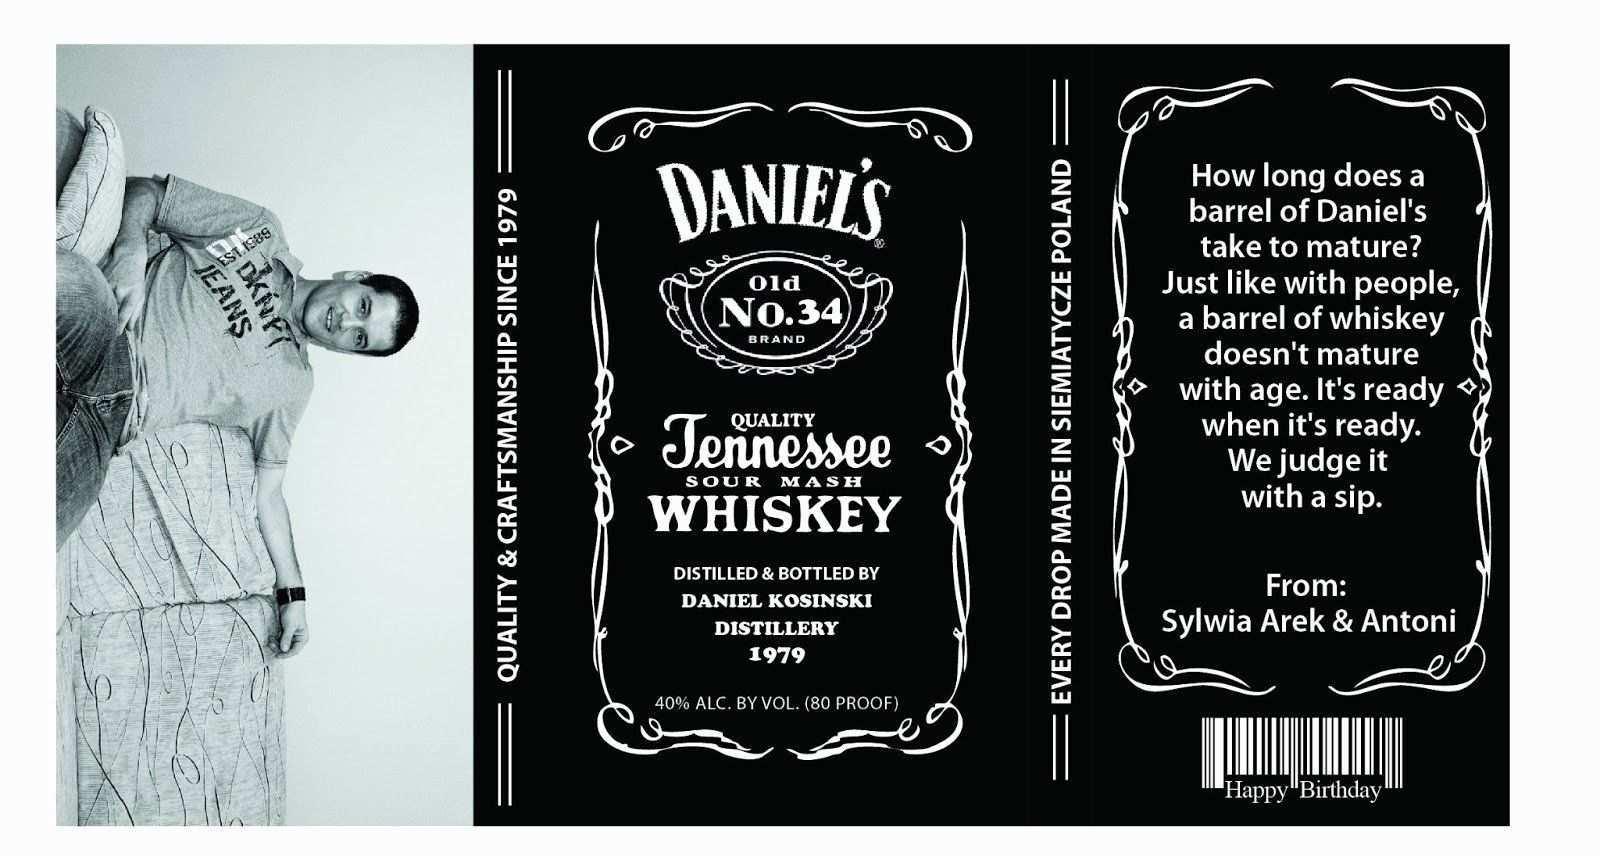 Free Jack Daniels Label Template Luxury 13 Einzigartig Jack Daniels Etikett Vorlage Robert Cv Label Templates Jack Daniels Label Printable Label Templates